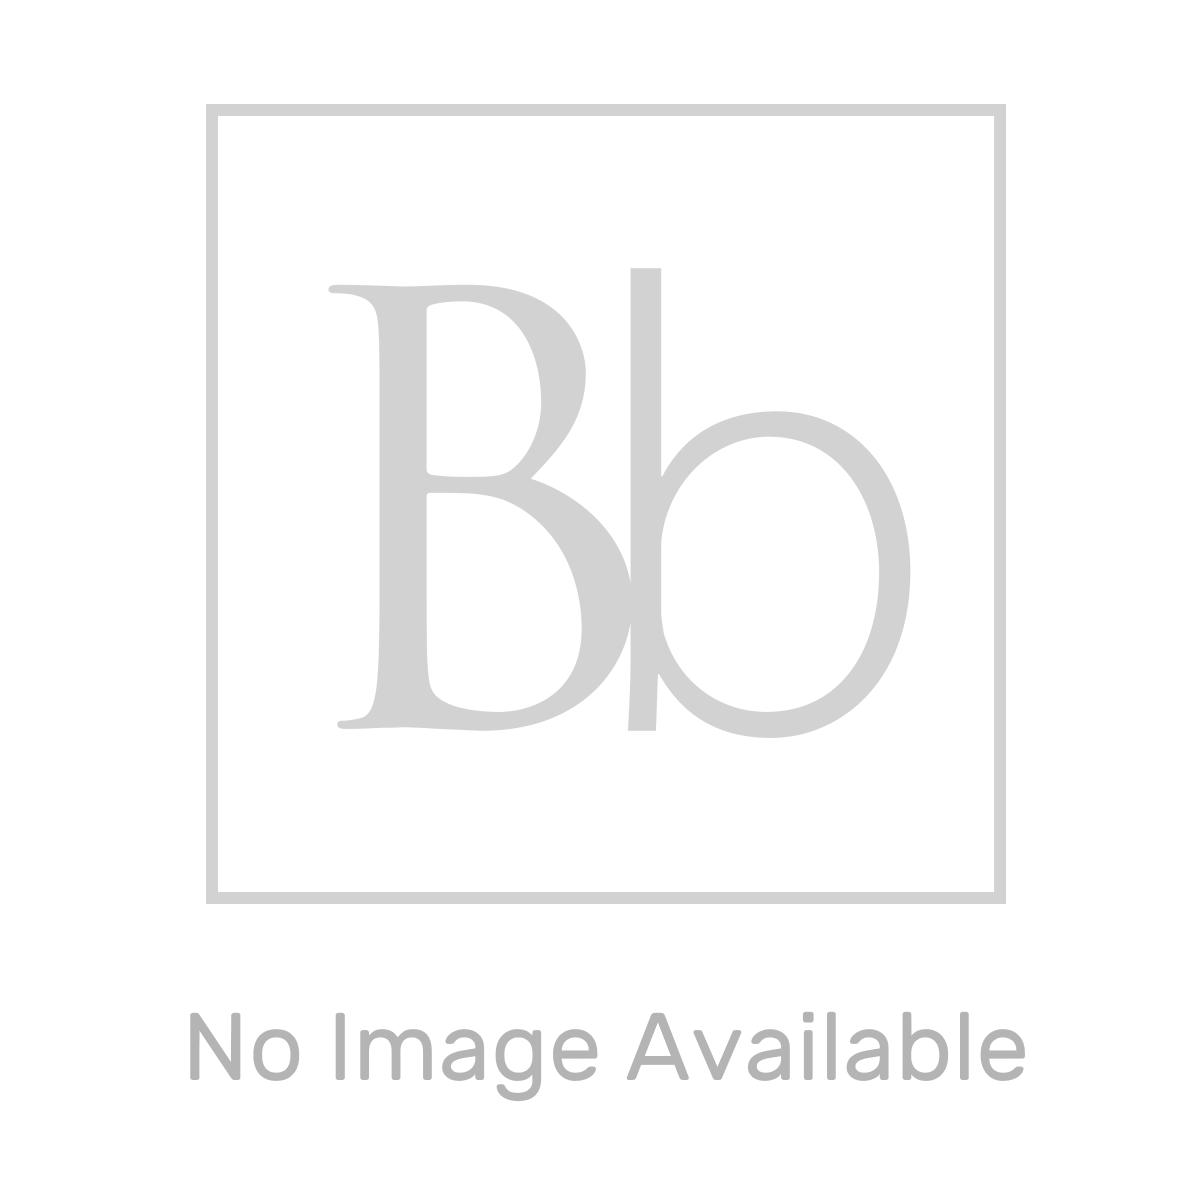 Aquadart Black Slate Shower Tray 1000 x 900